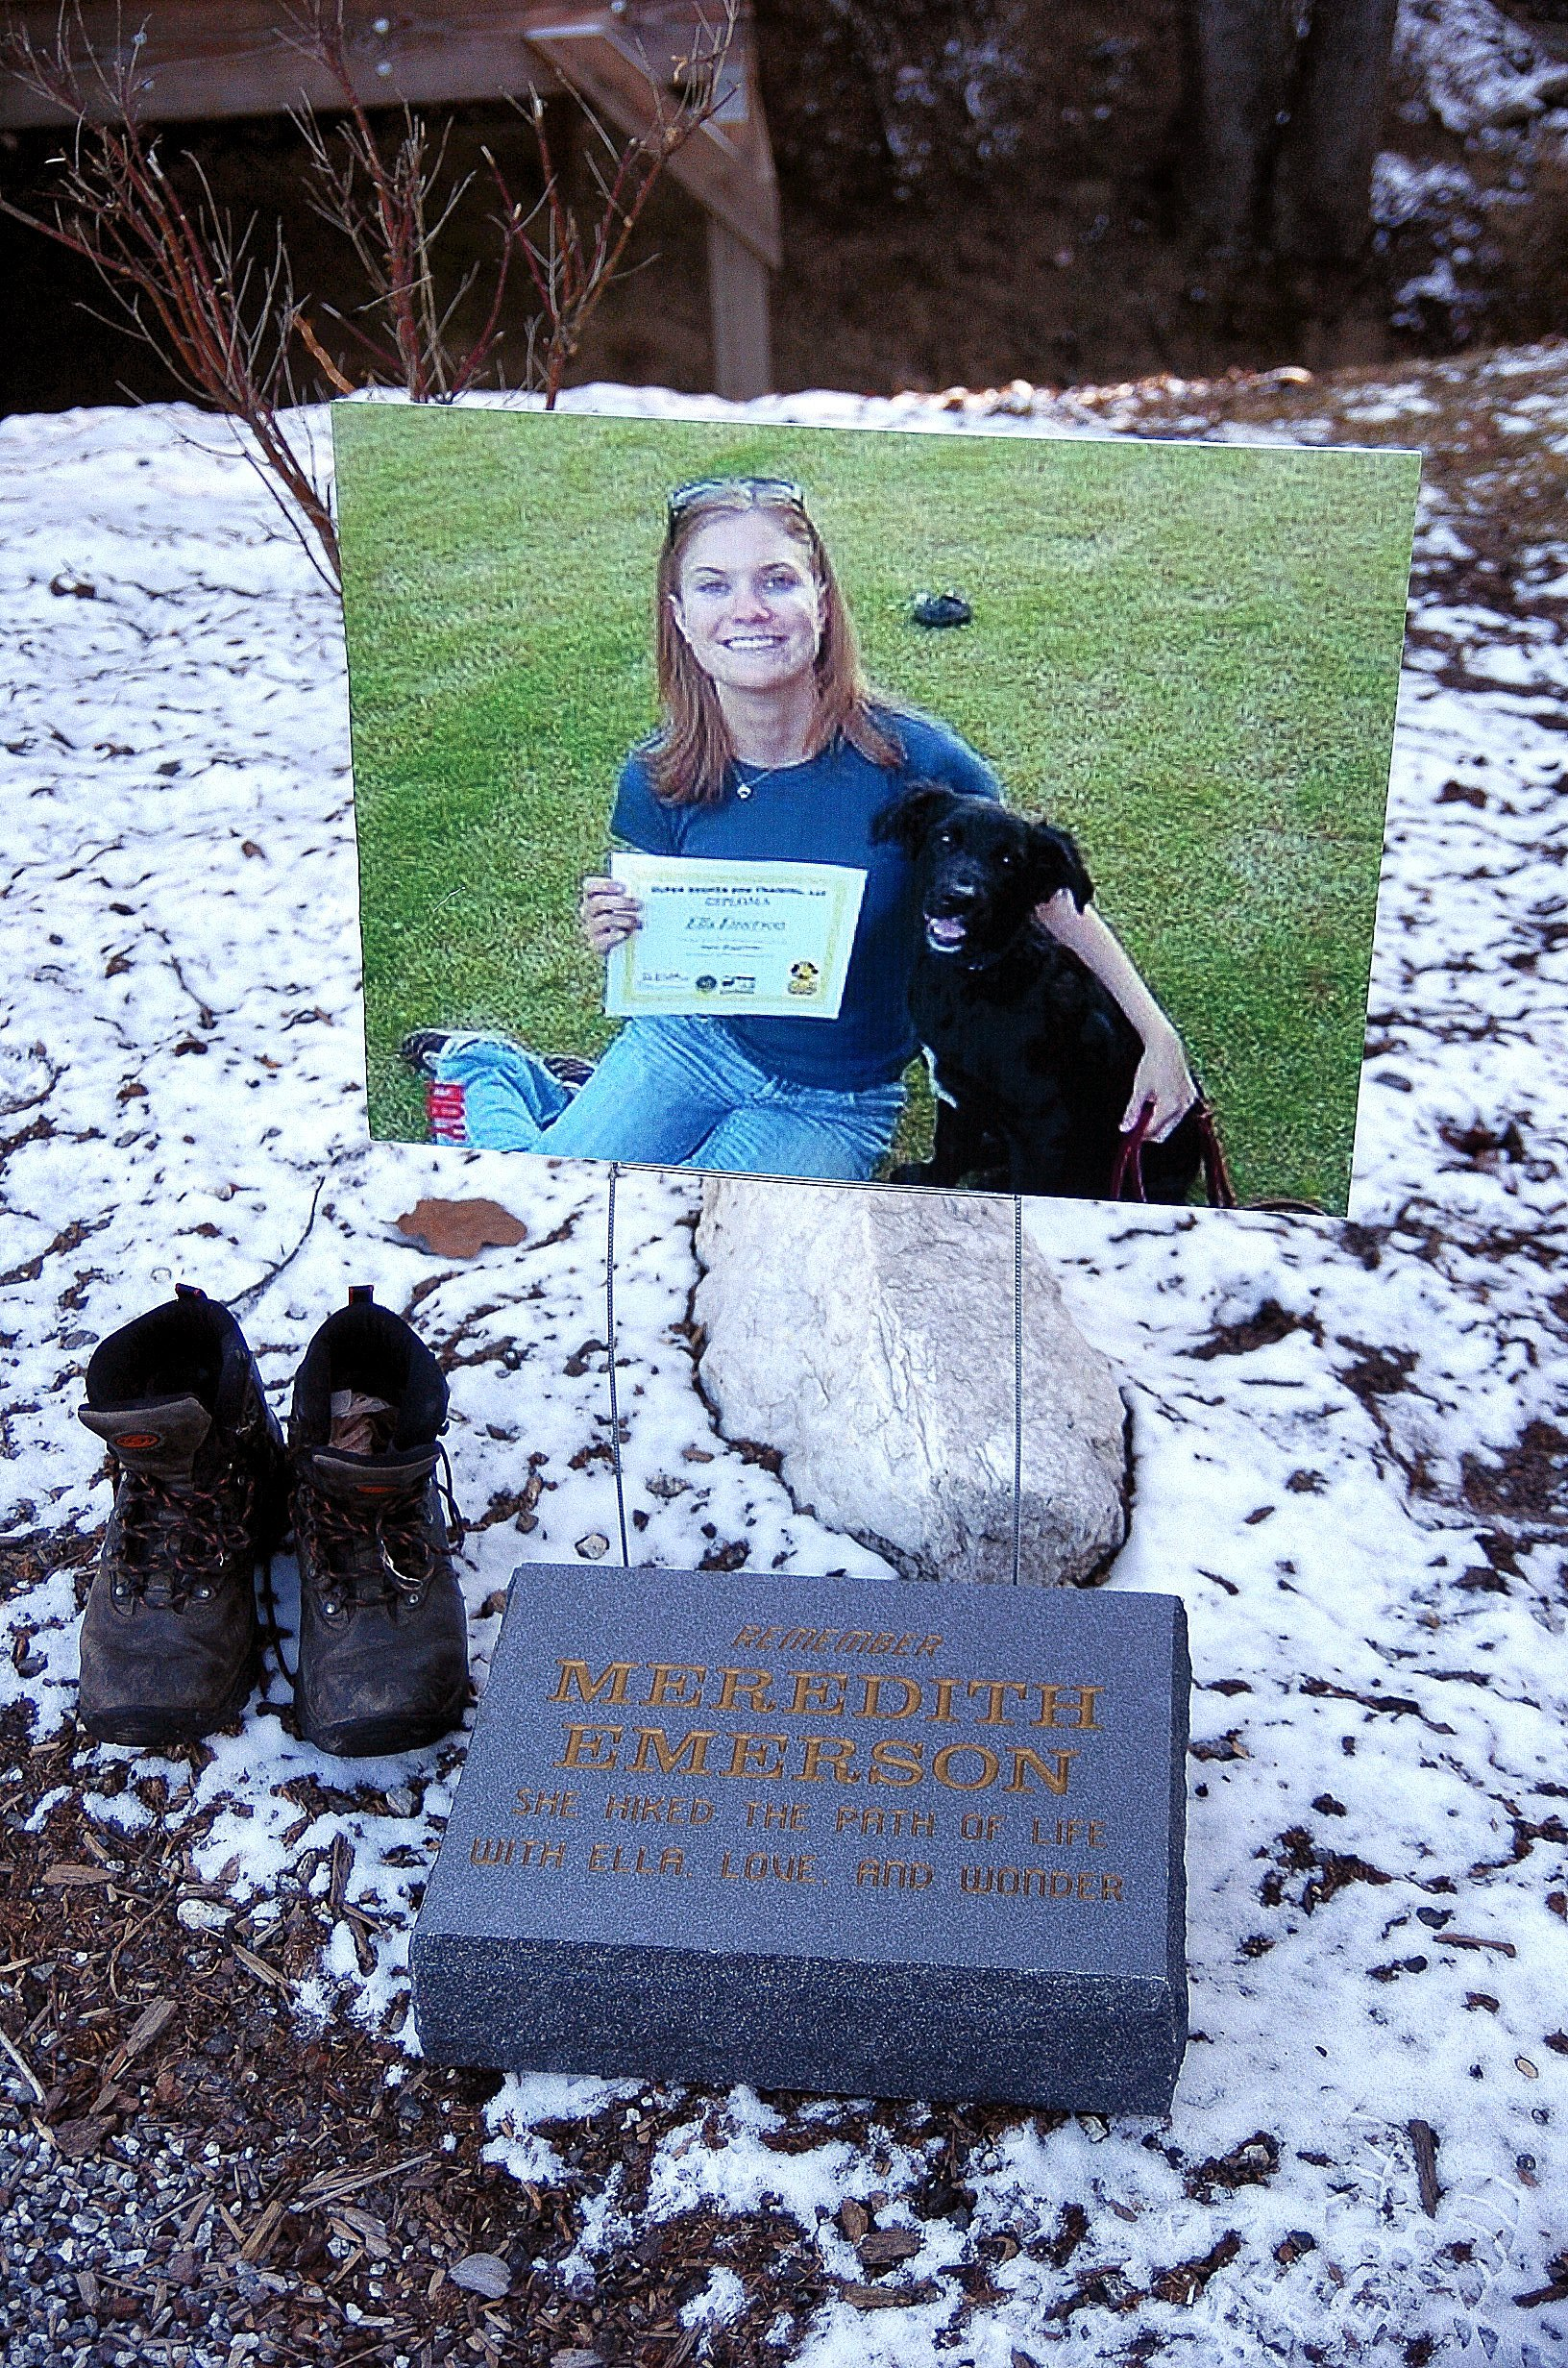 Emerson memorial